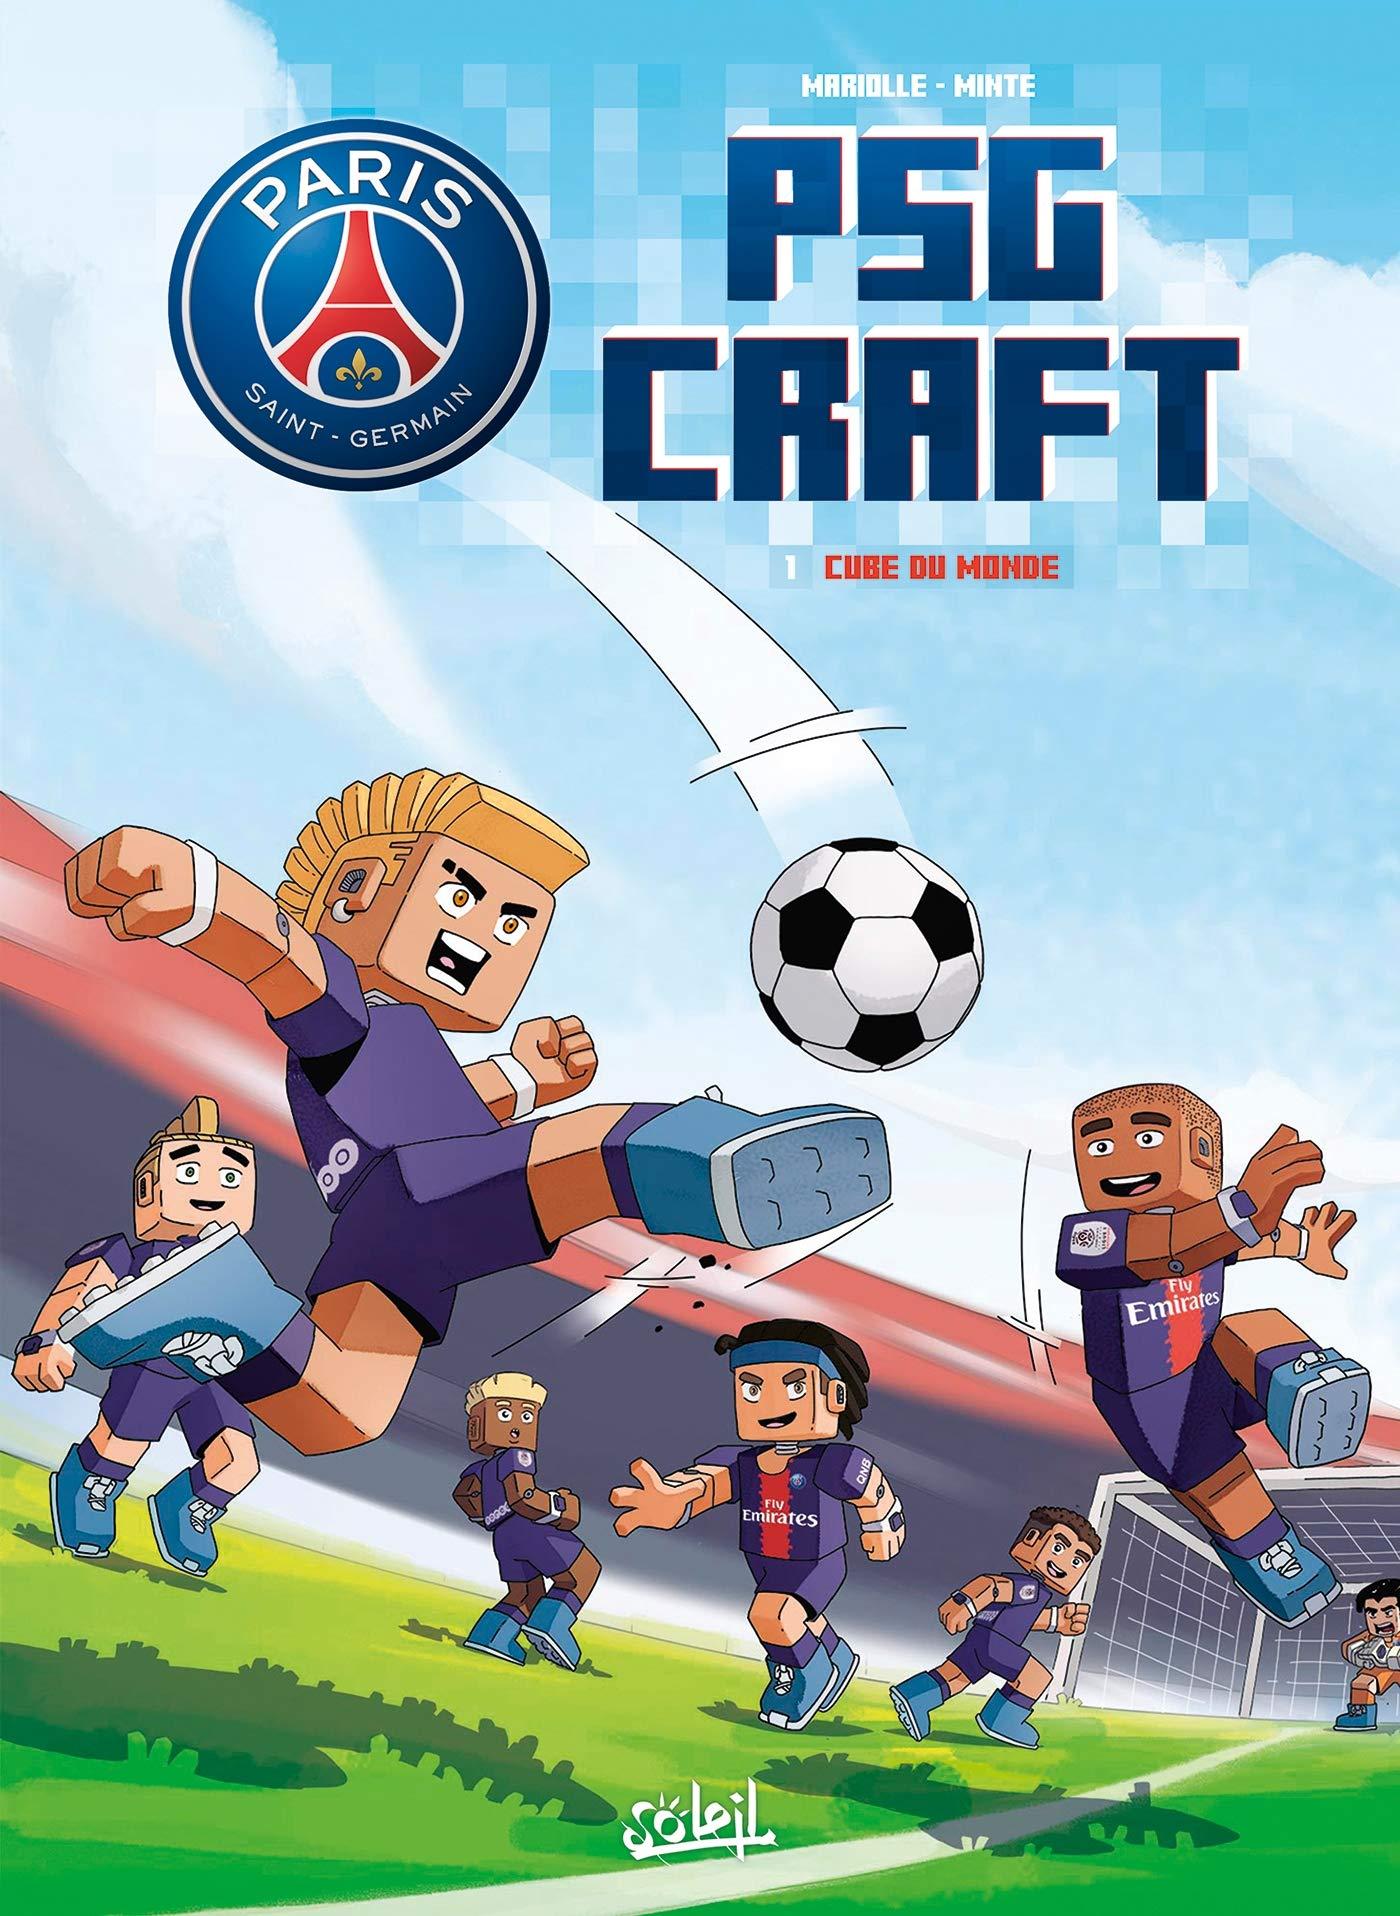 Paris Saint-Germain - PSG Craft 1 - Cube du Monde